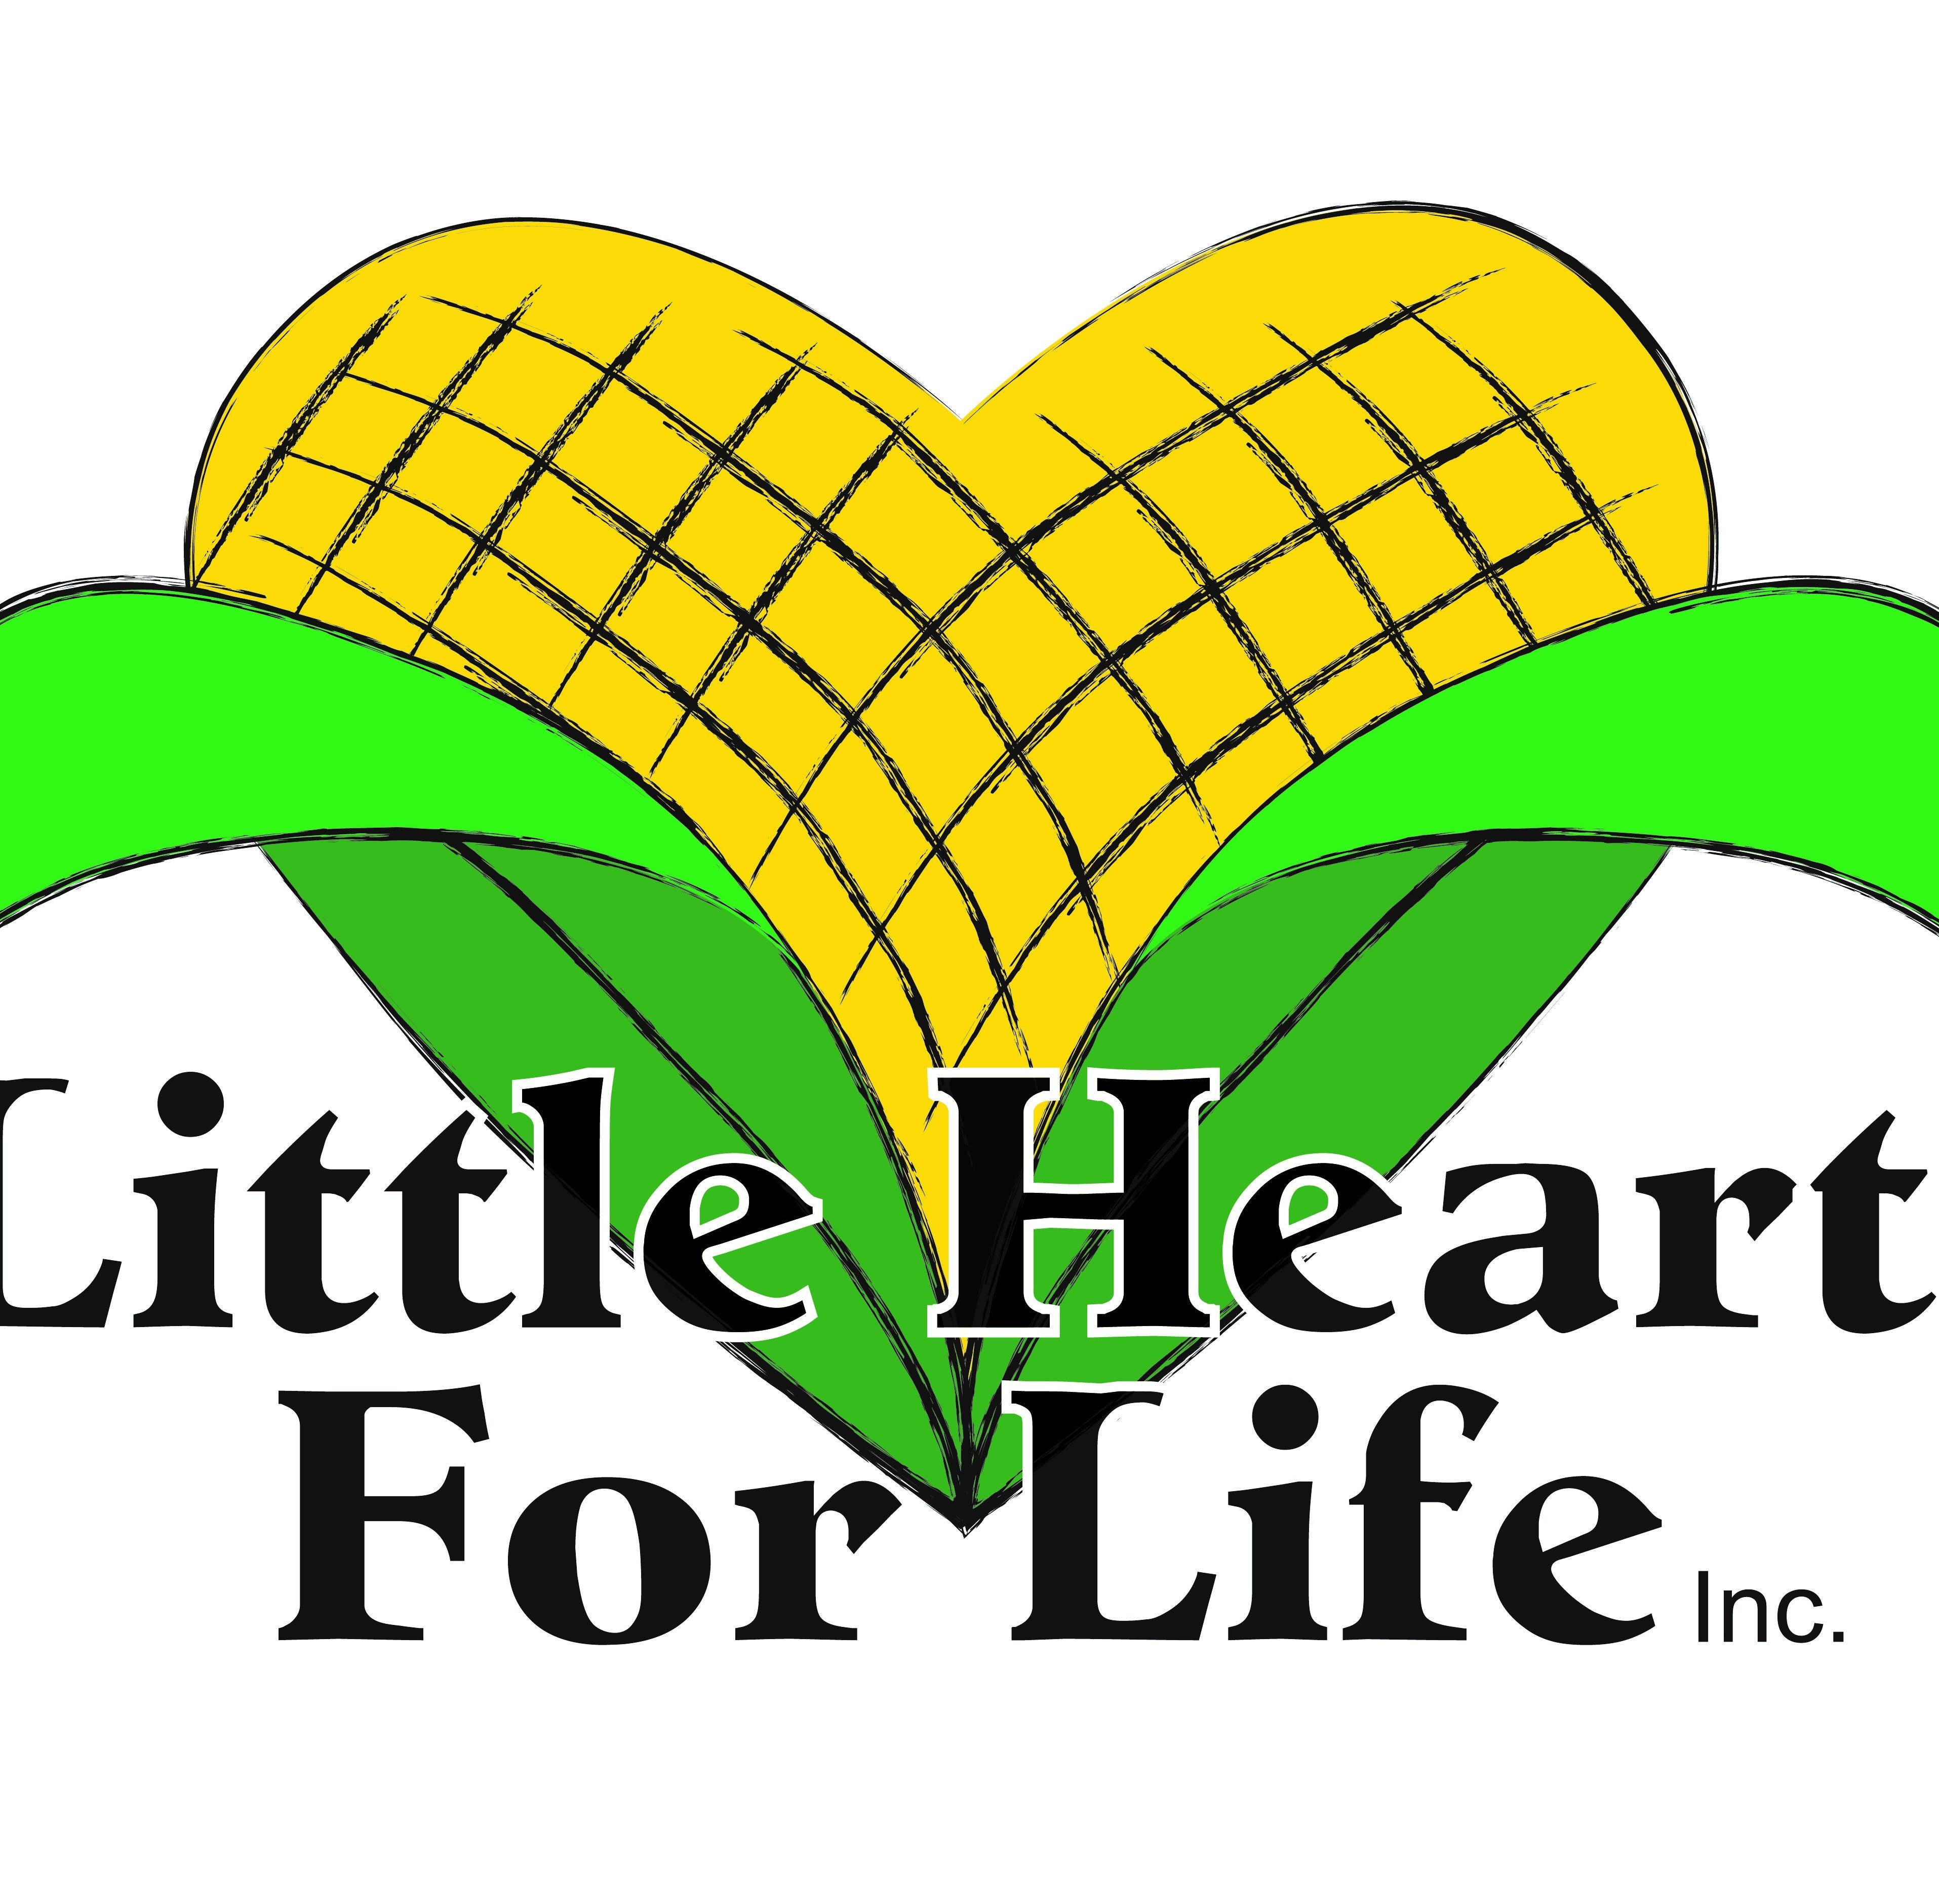 Families pour hearts into pediatric cardiac fundraiser